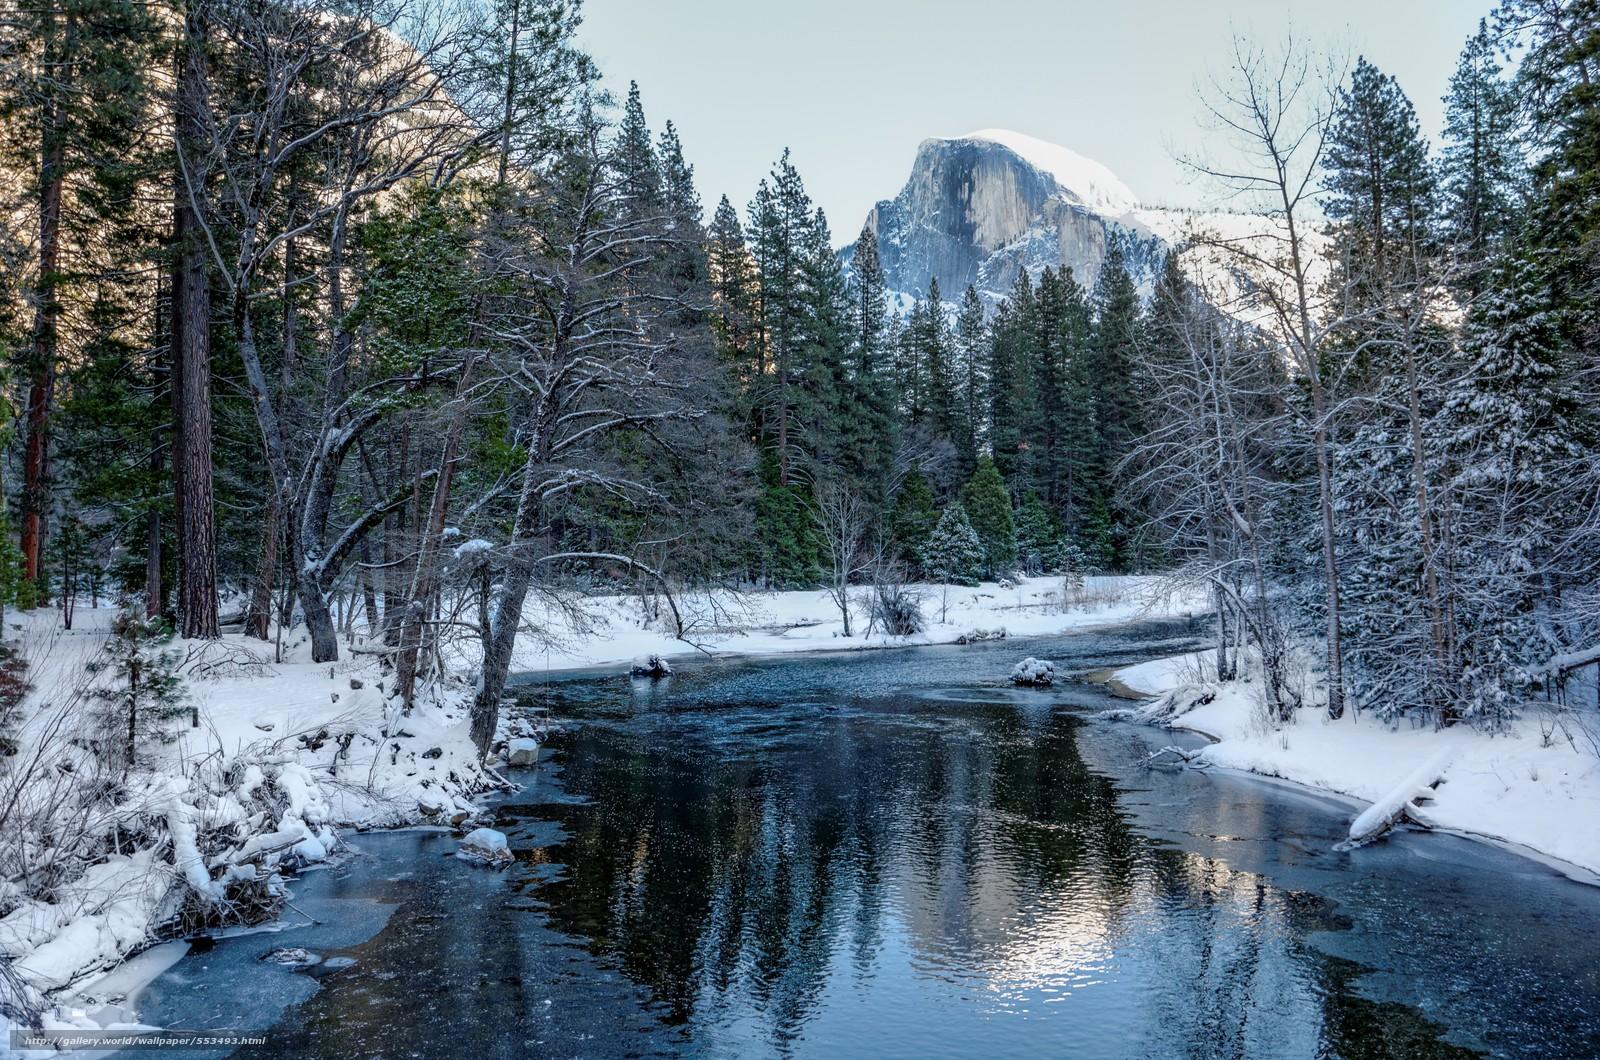 wallpaper Yosemite National Park river trees Mountains desktop 1600x1060